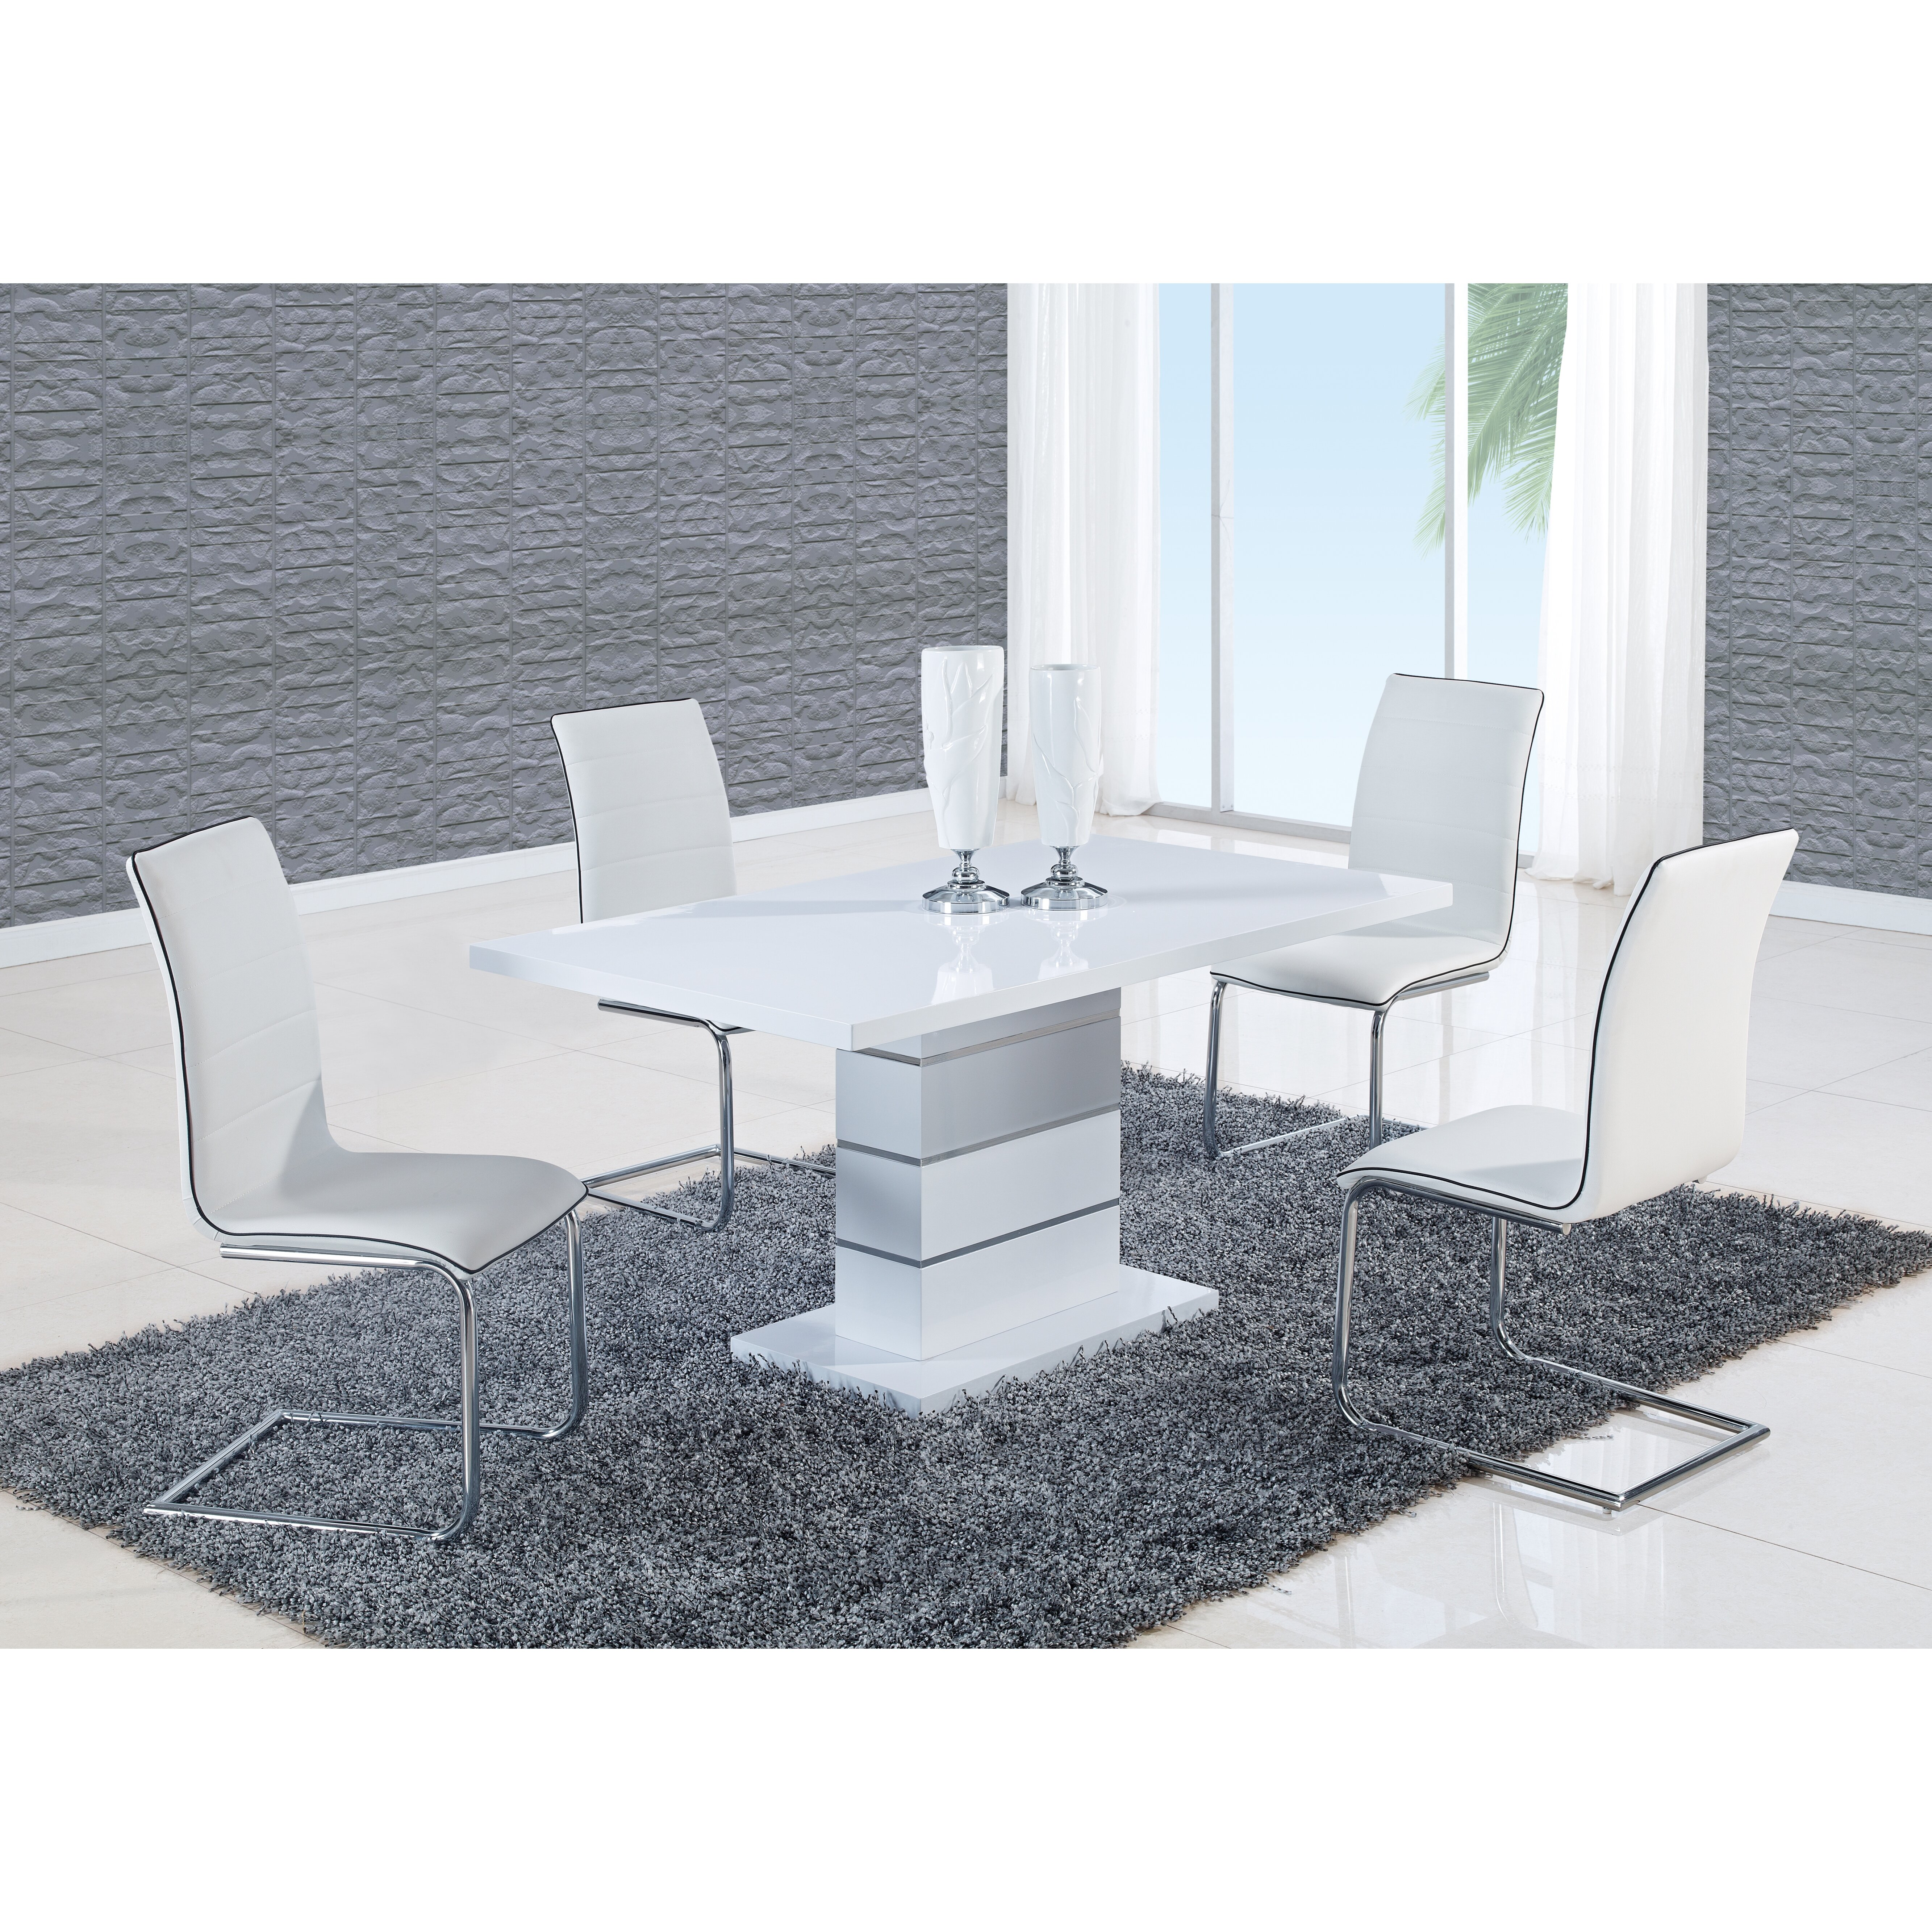 Global Furniture USA Dining Table  Reviews Wayfair - Dining room furniture usa